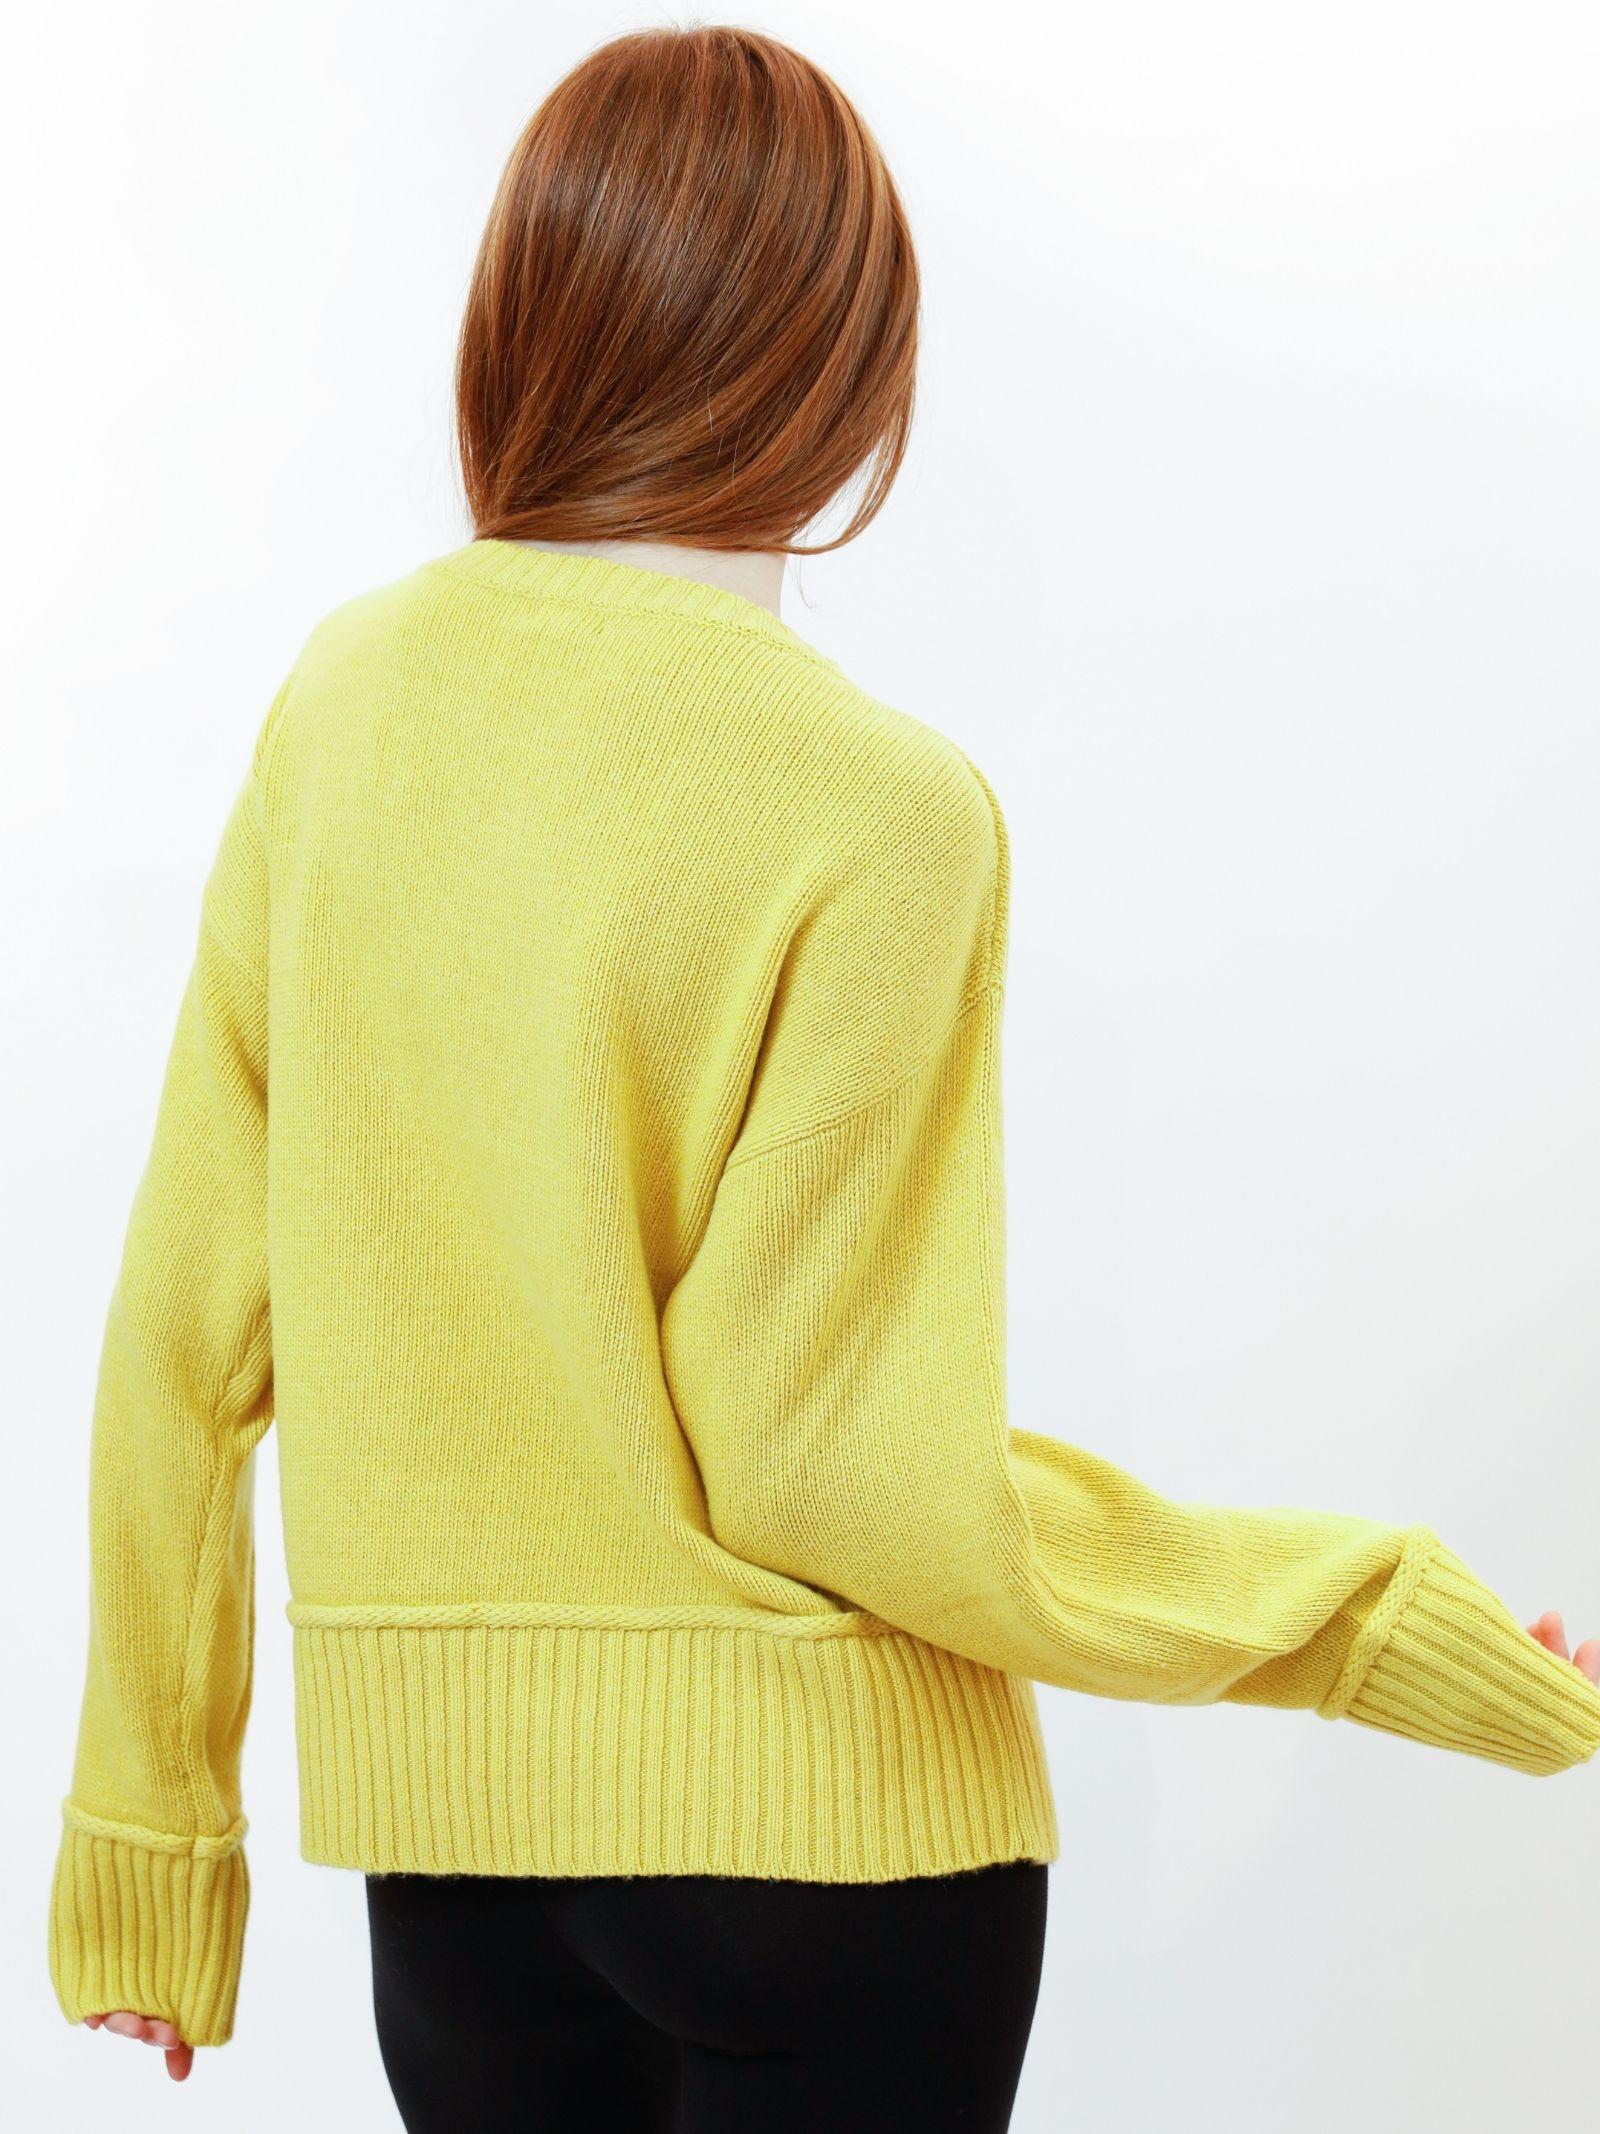 Women's Clothing Sweater in Yellow Merino Cashmere with Crew-neck Maliparmi | Knitwear | JQ48857431570009